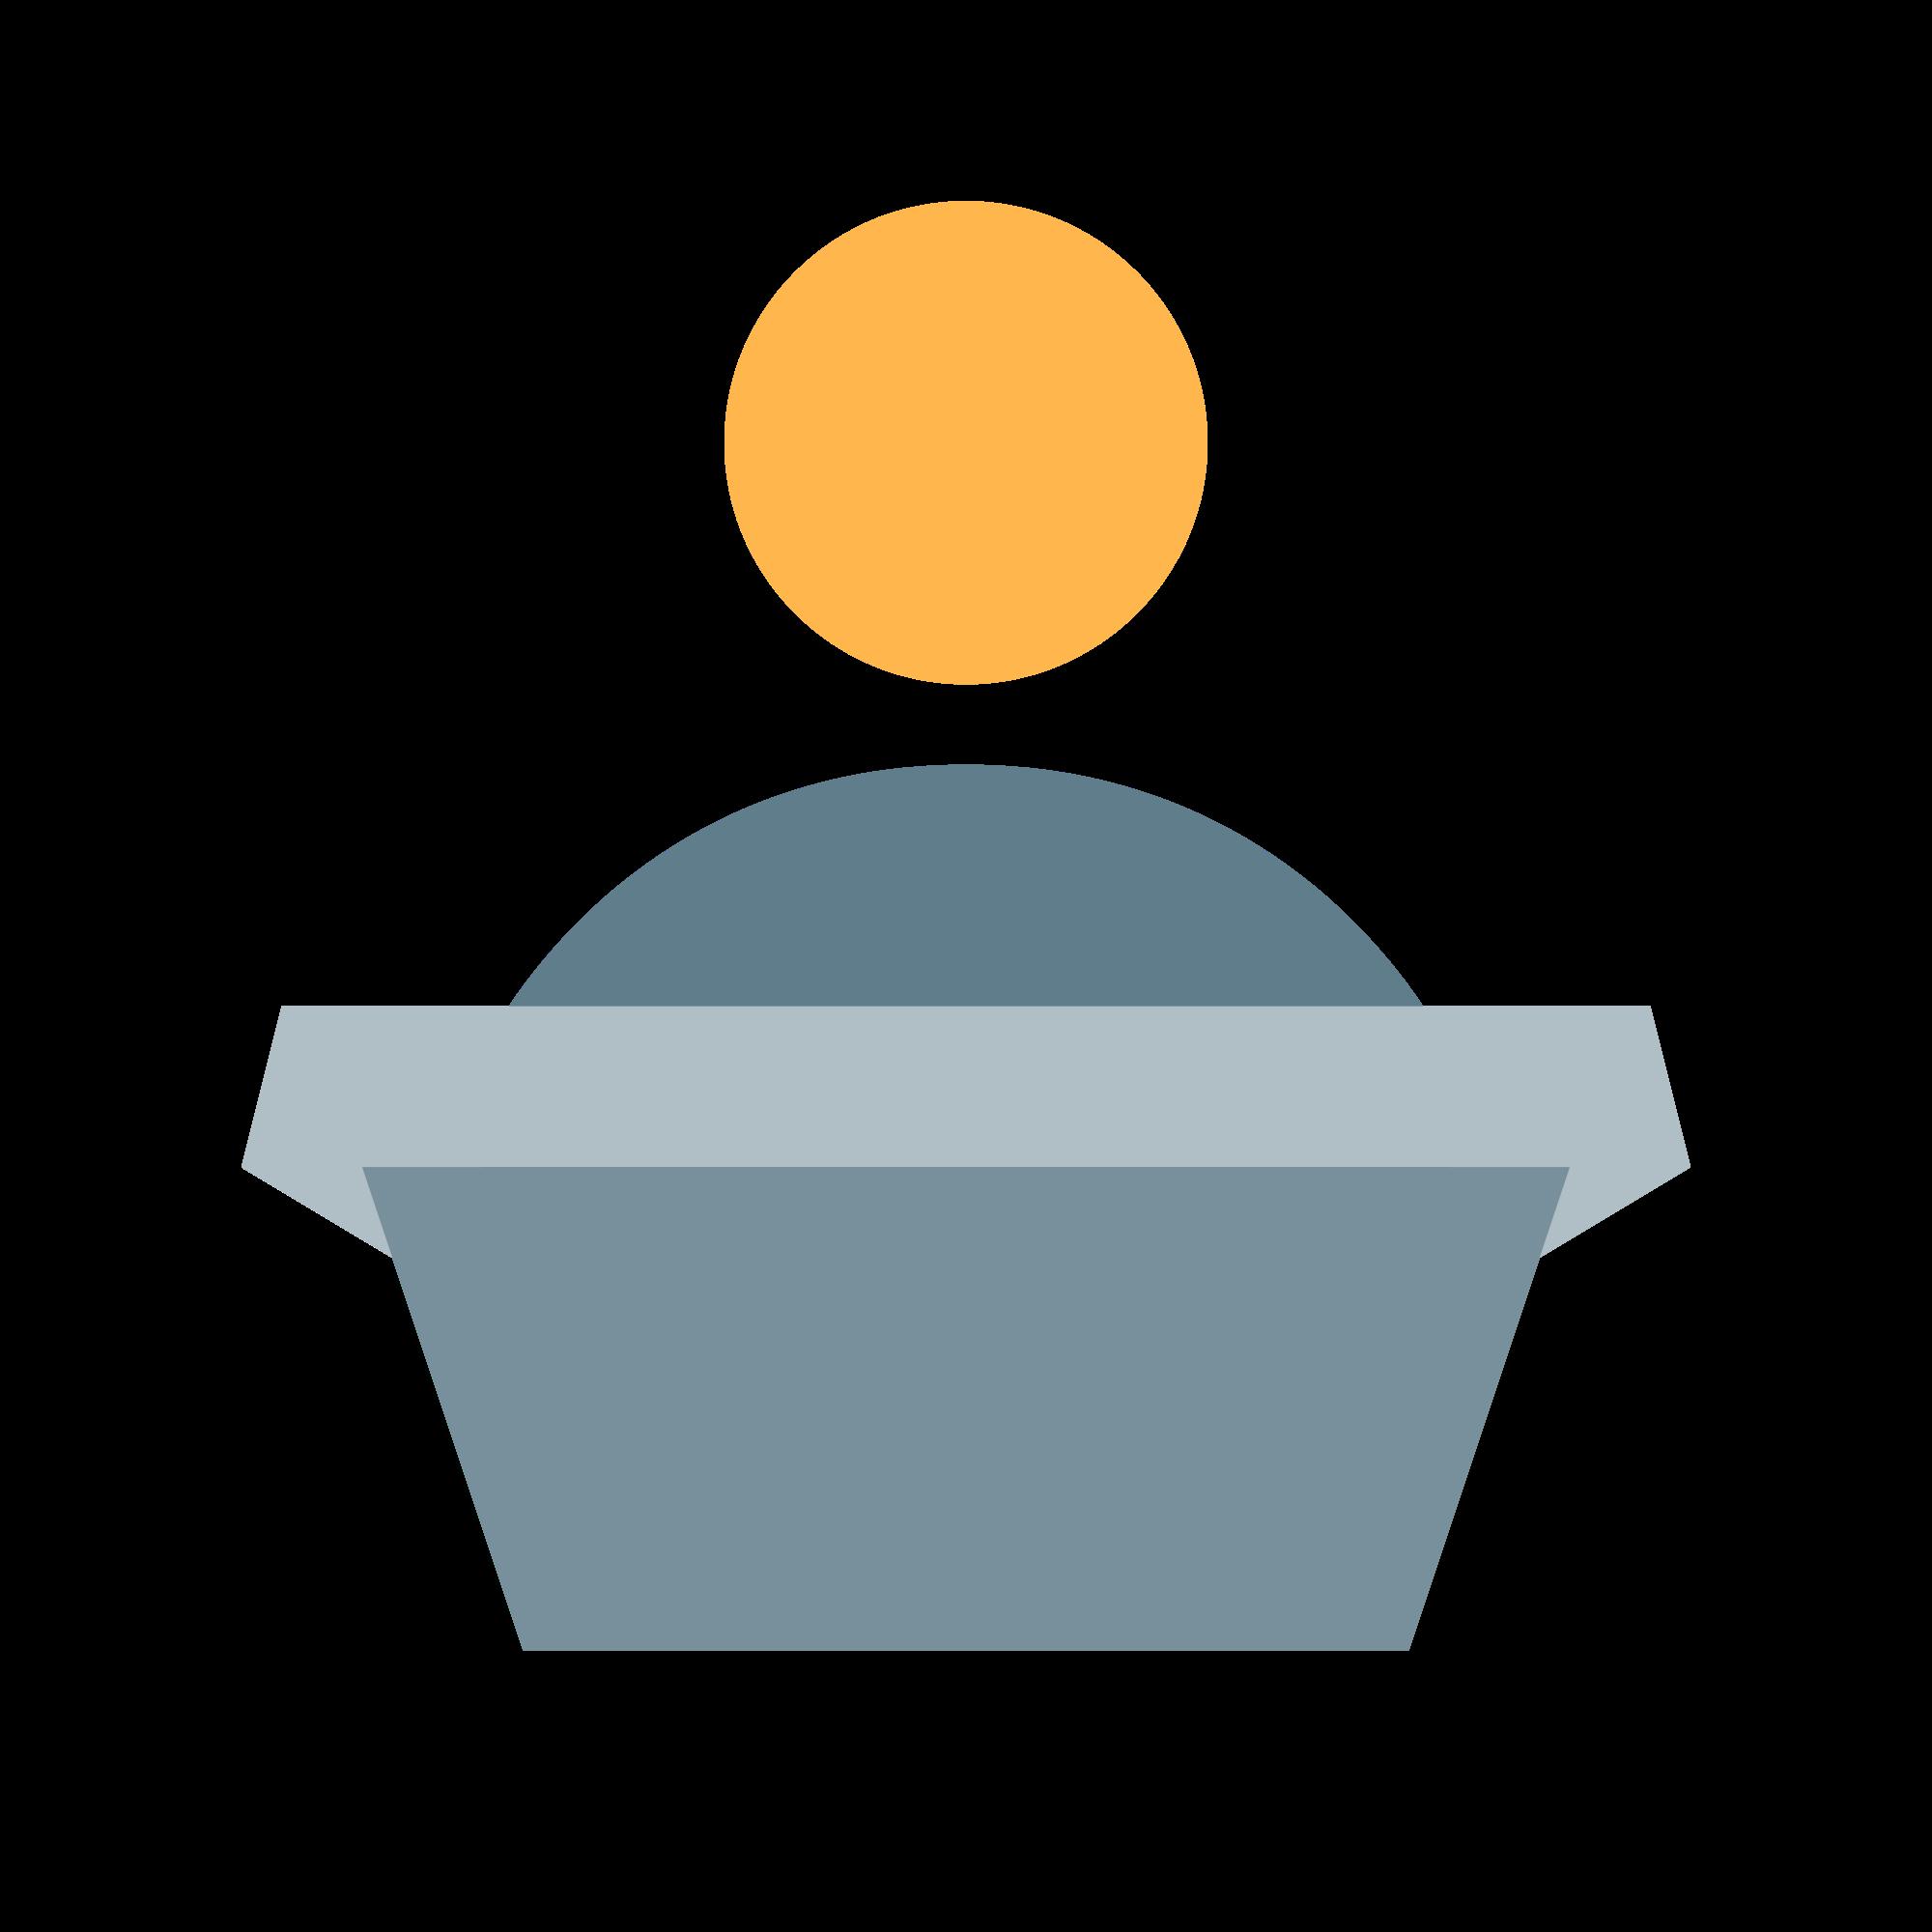 File icons flat with. Podium clipart speaker podium